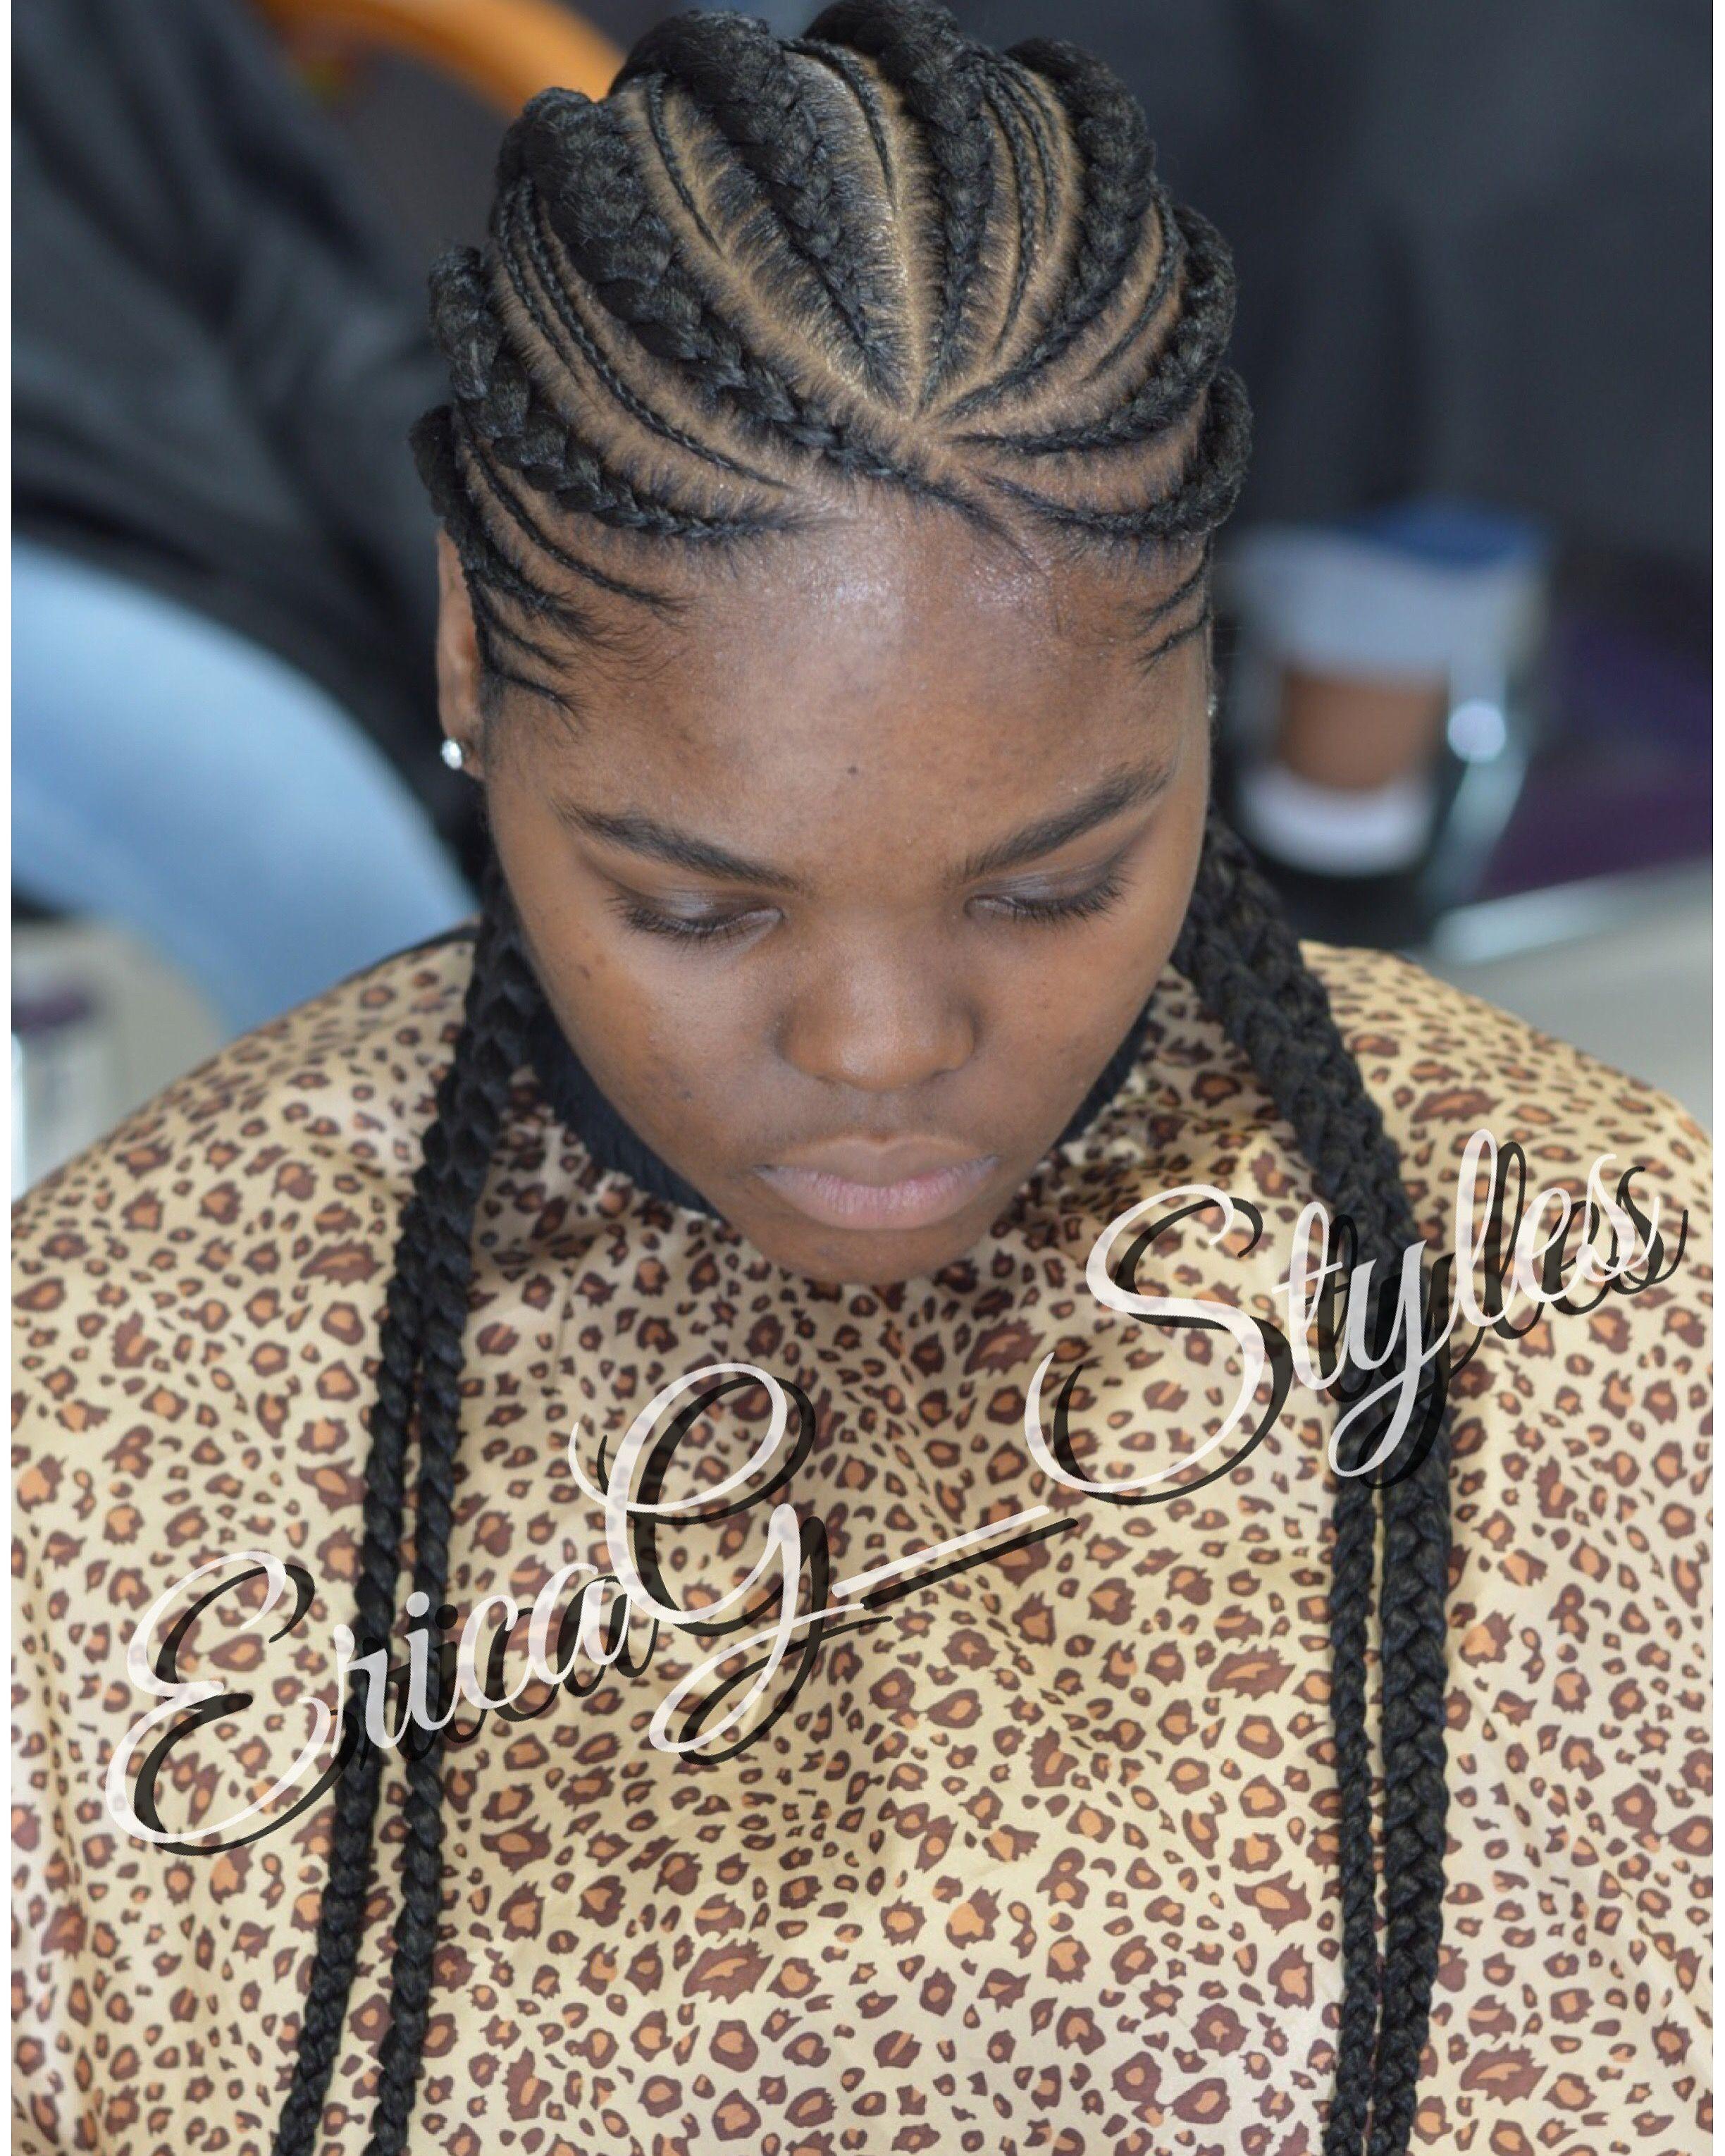 Latest Ghana Braids Hairstyles: 40+ Totally Gorgeous Ghana Braids Hairstyles